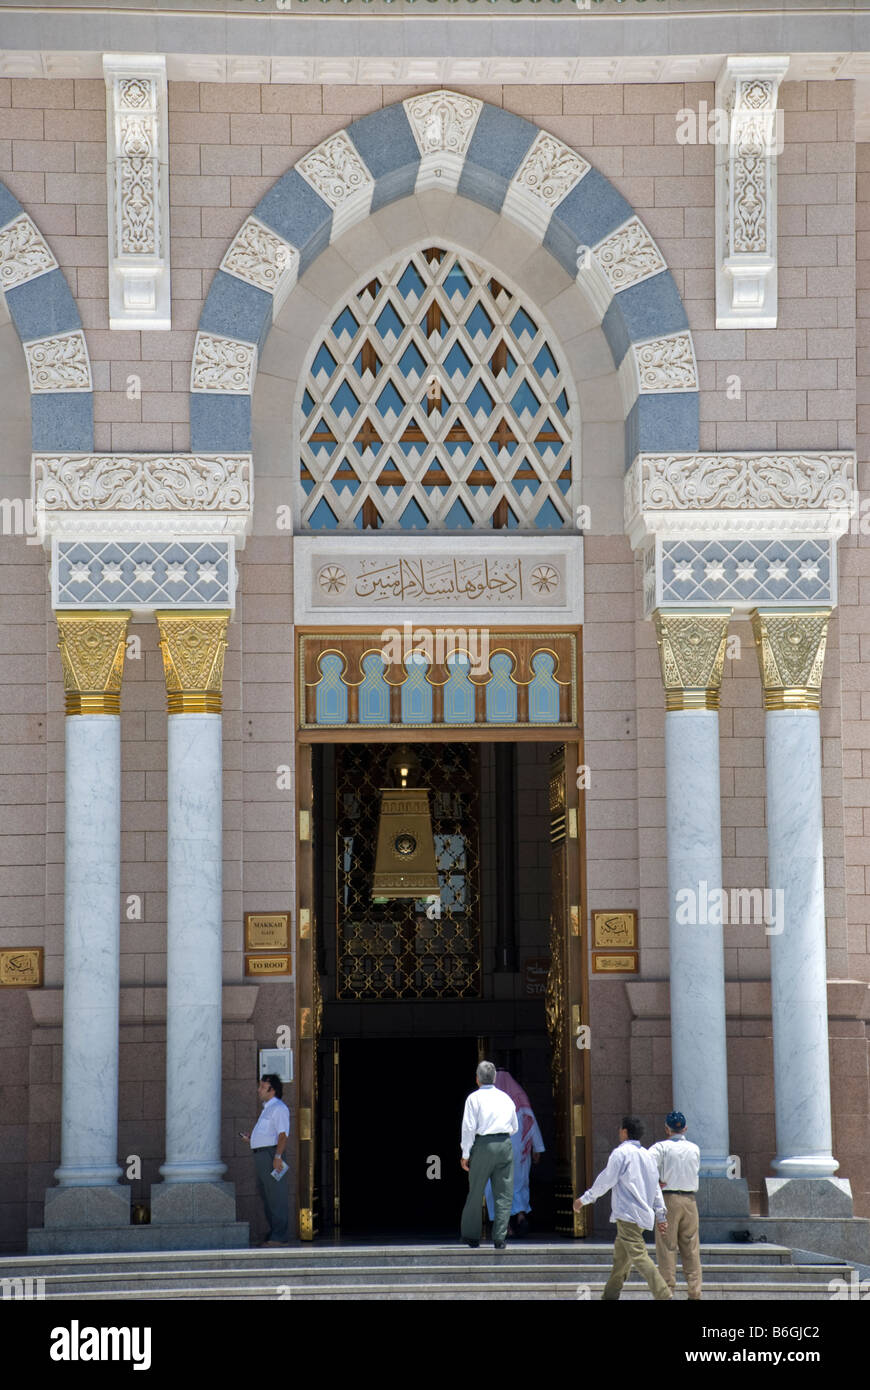 Doors of the Makkah gate The Mosque of the Prophet Masjid al Nabawi Madinah Saudi Arabia & Doors of the Makkah gate The Mosque of the Prophet Masjid al Nabawi ...